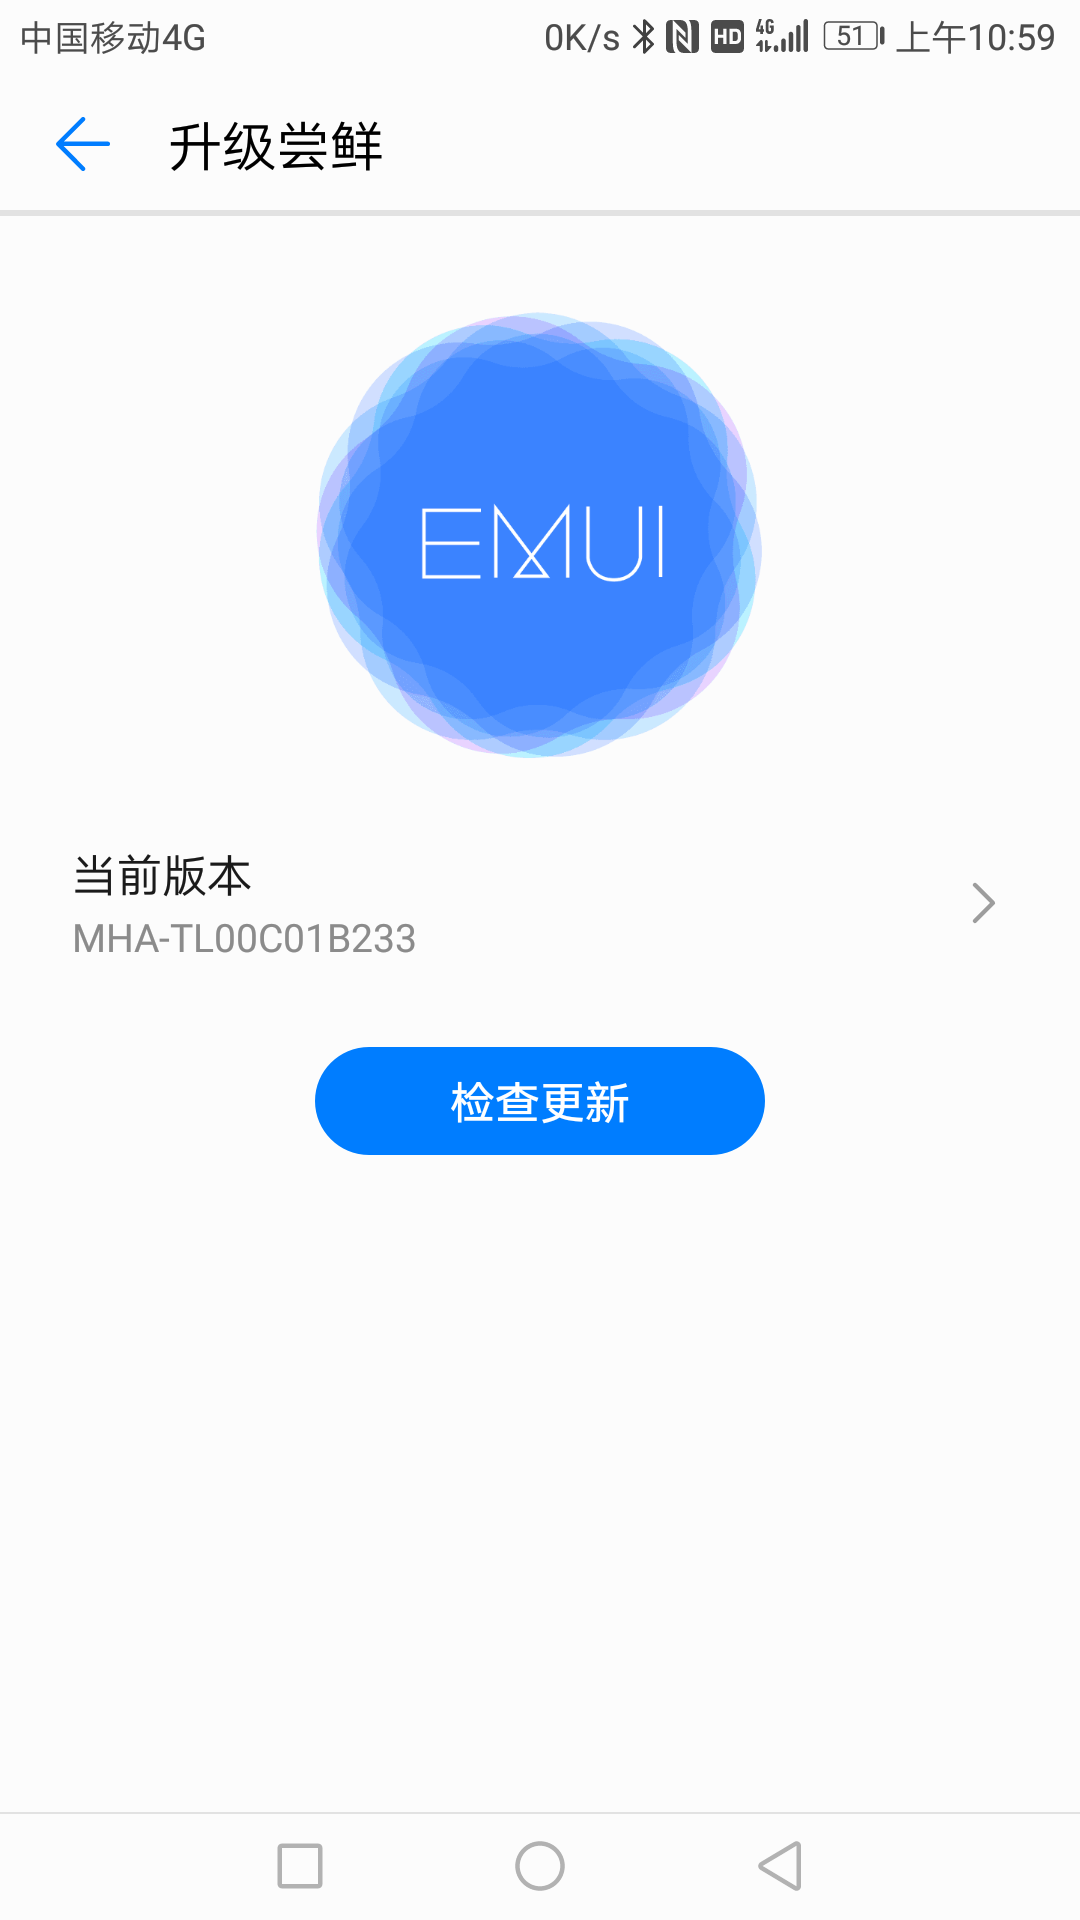 Screenshot_20200514-105952.png